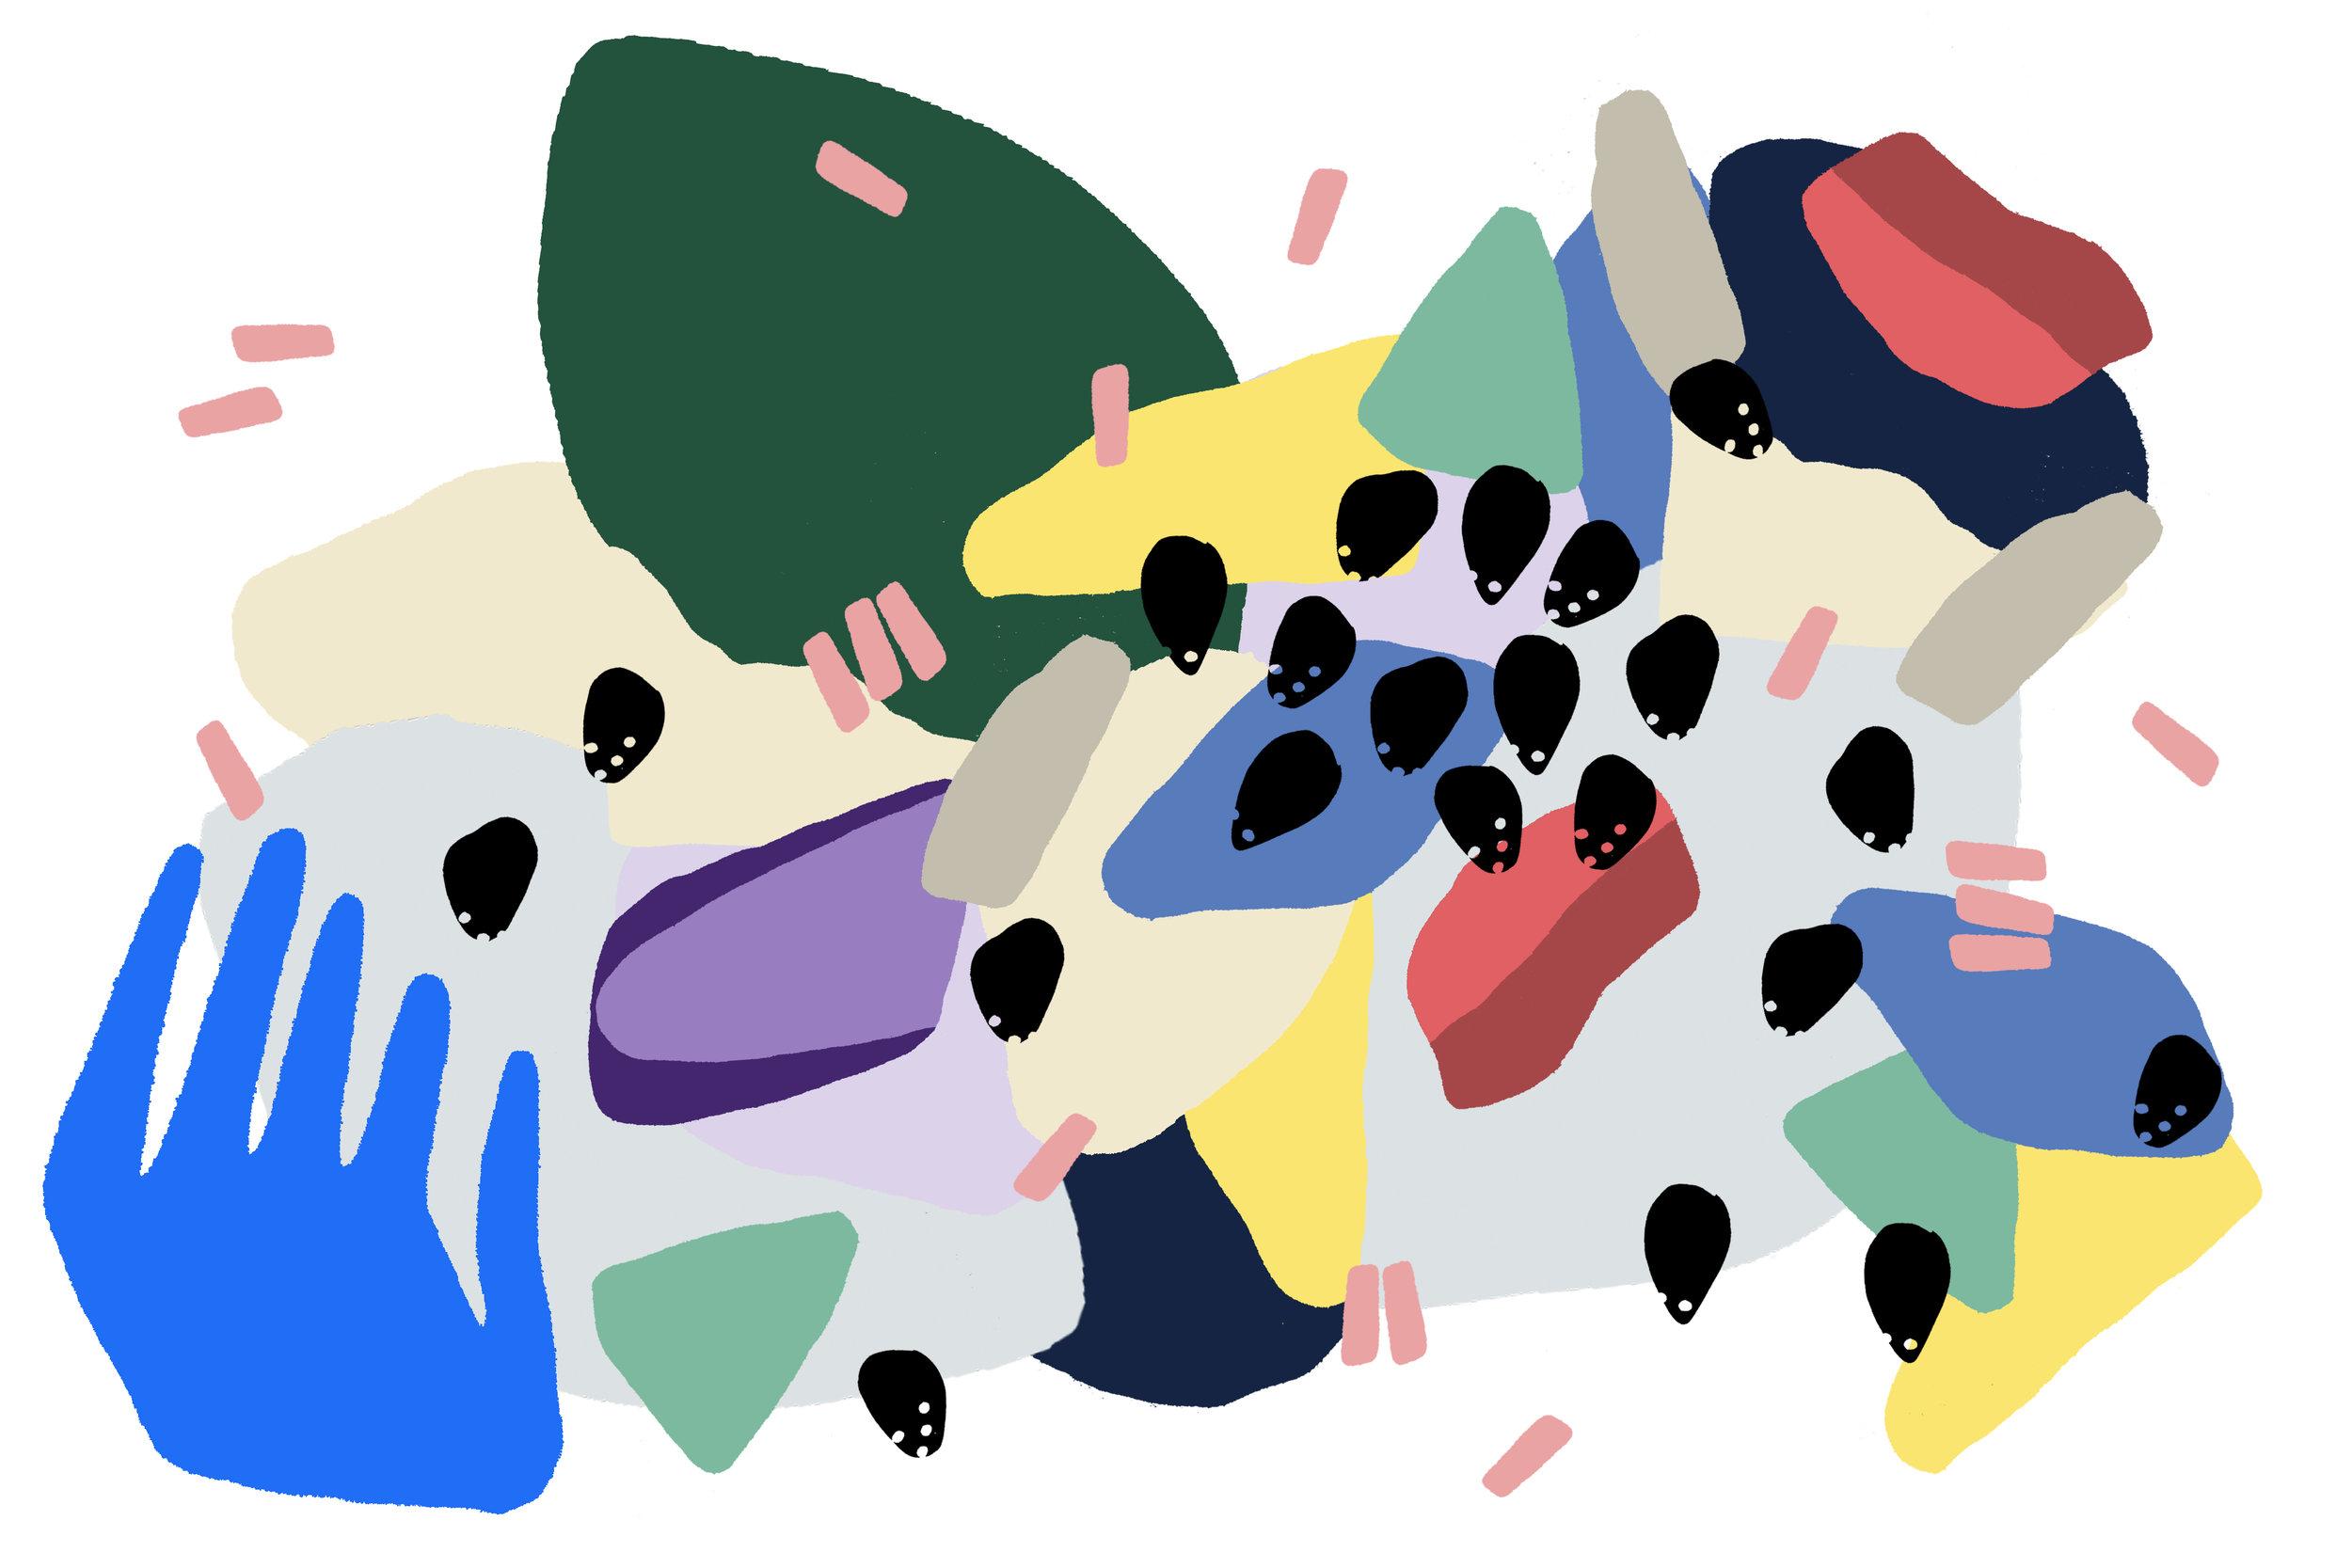 Illustration for startup focused site,  AngelList .